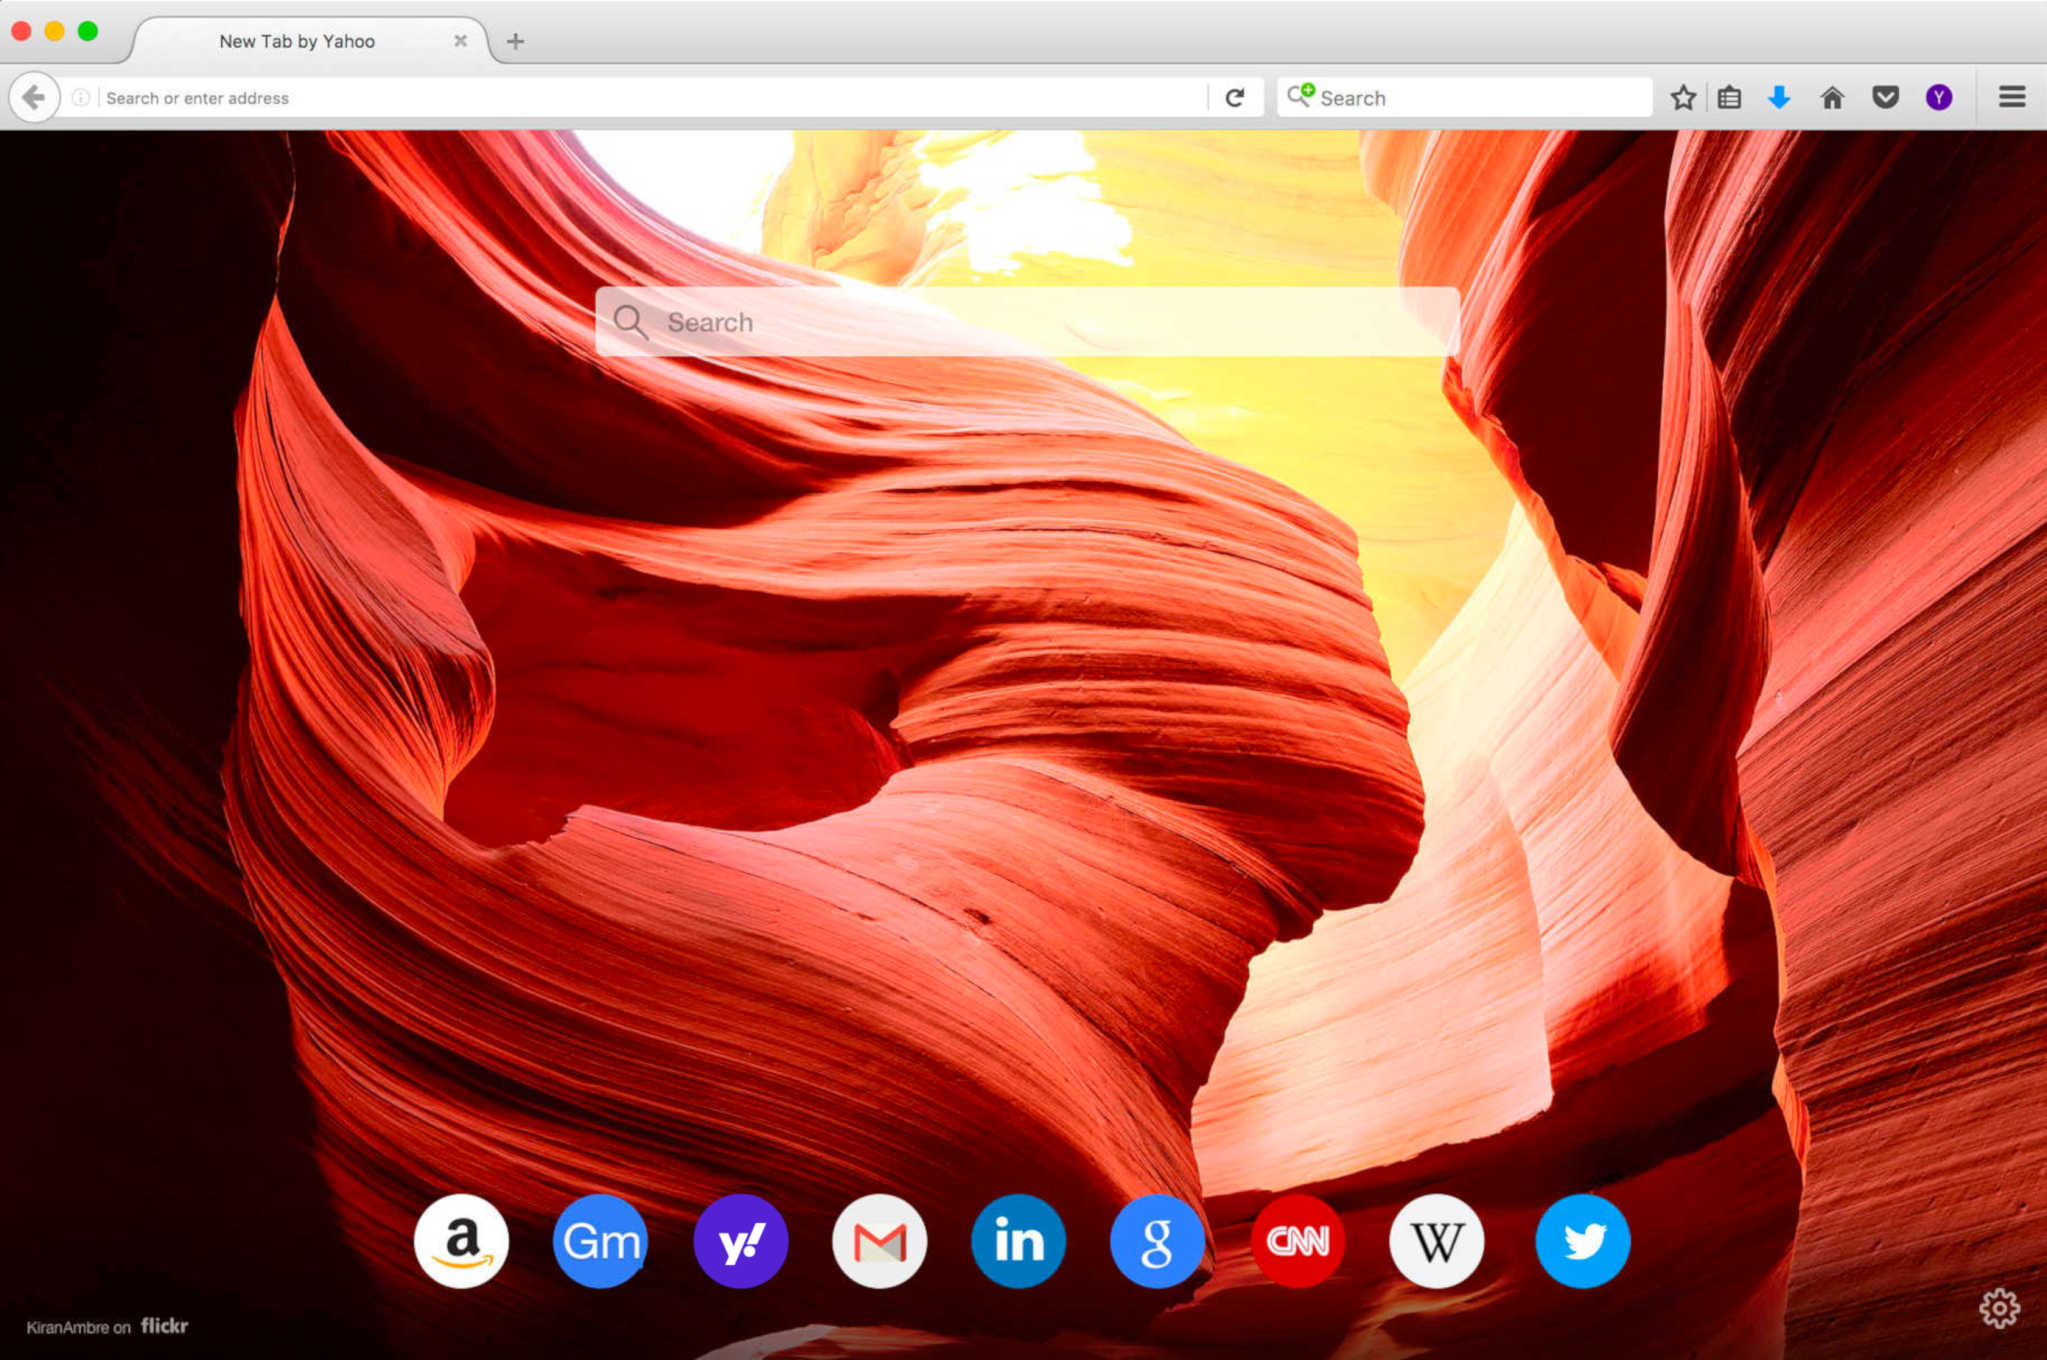 yahoo messenger free download for google chrome